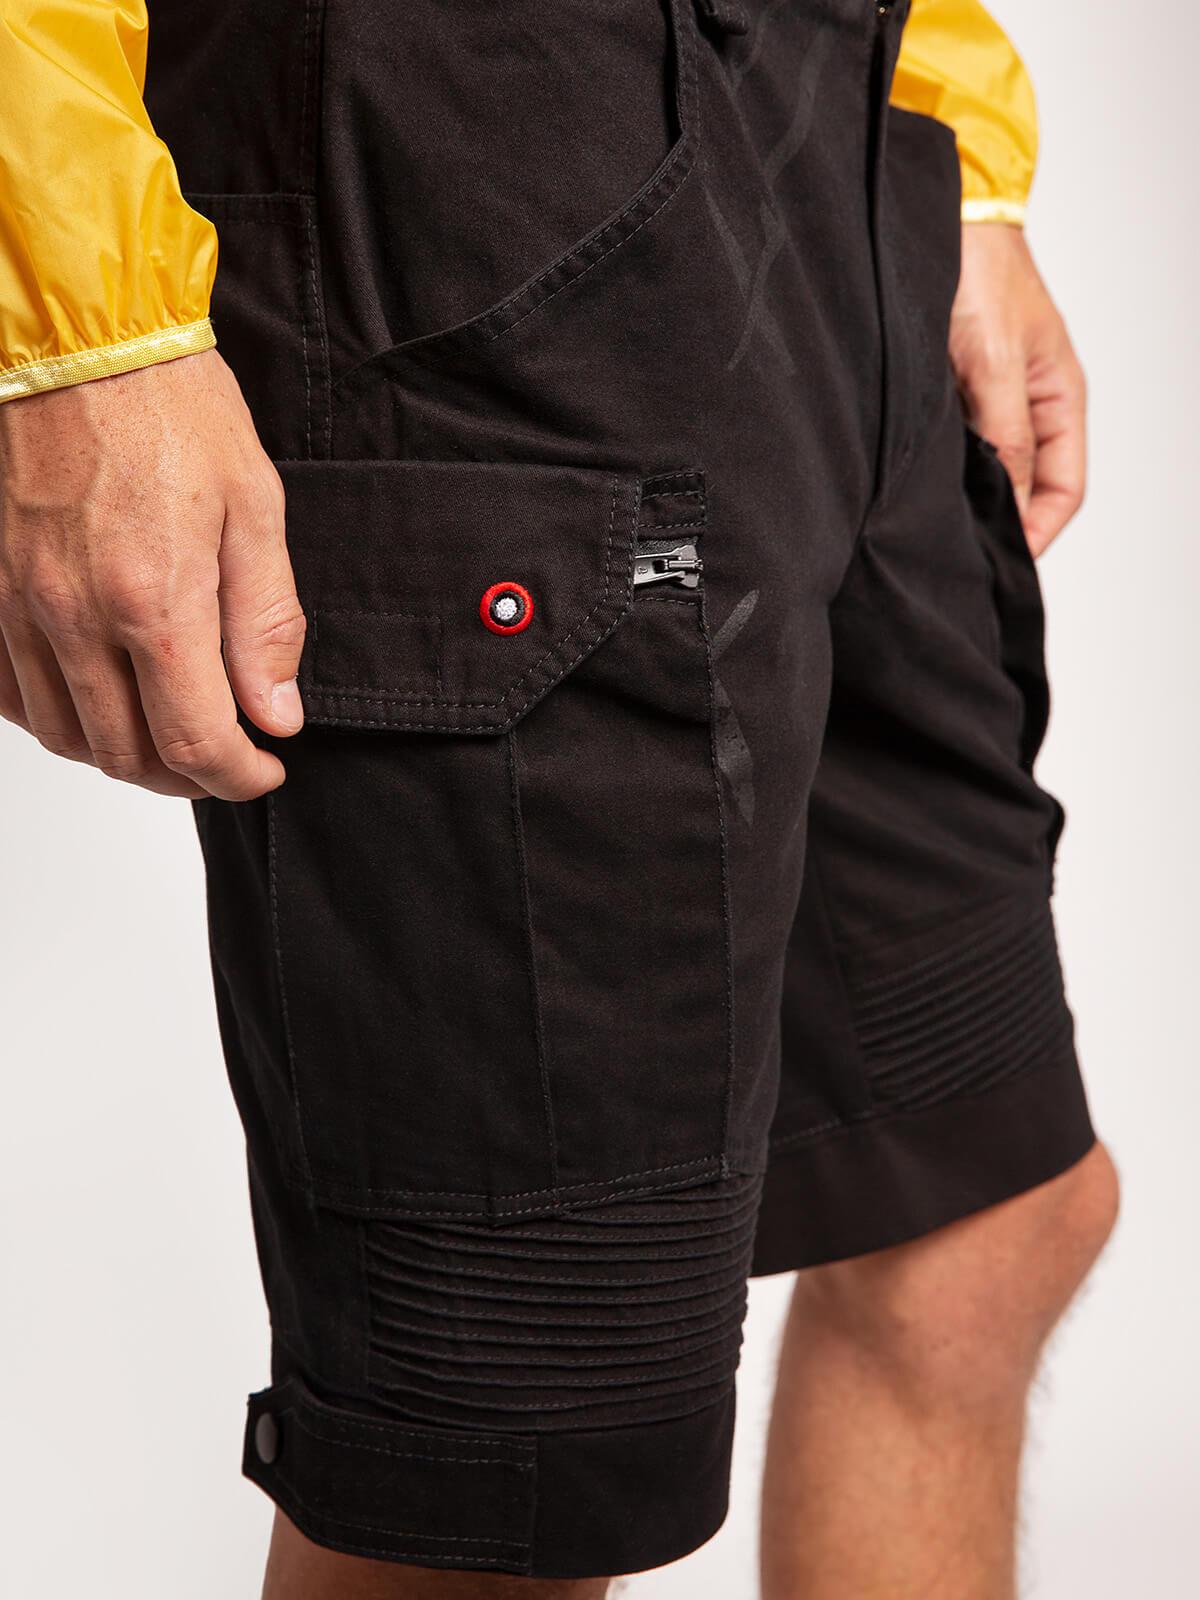 Men's Shorts Flyer. Color black. 5.